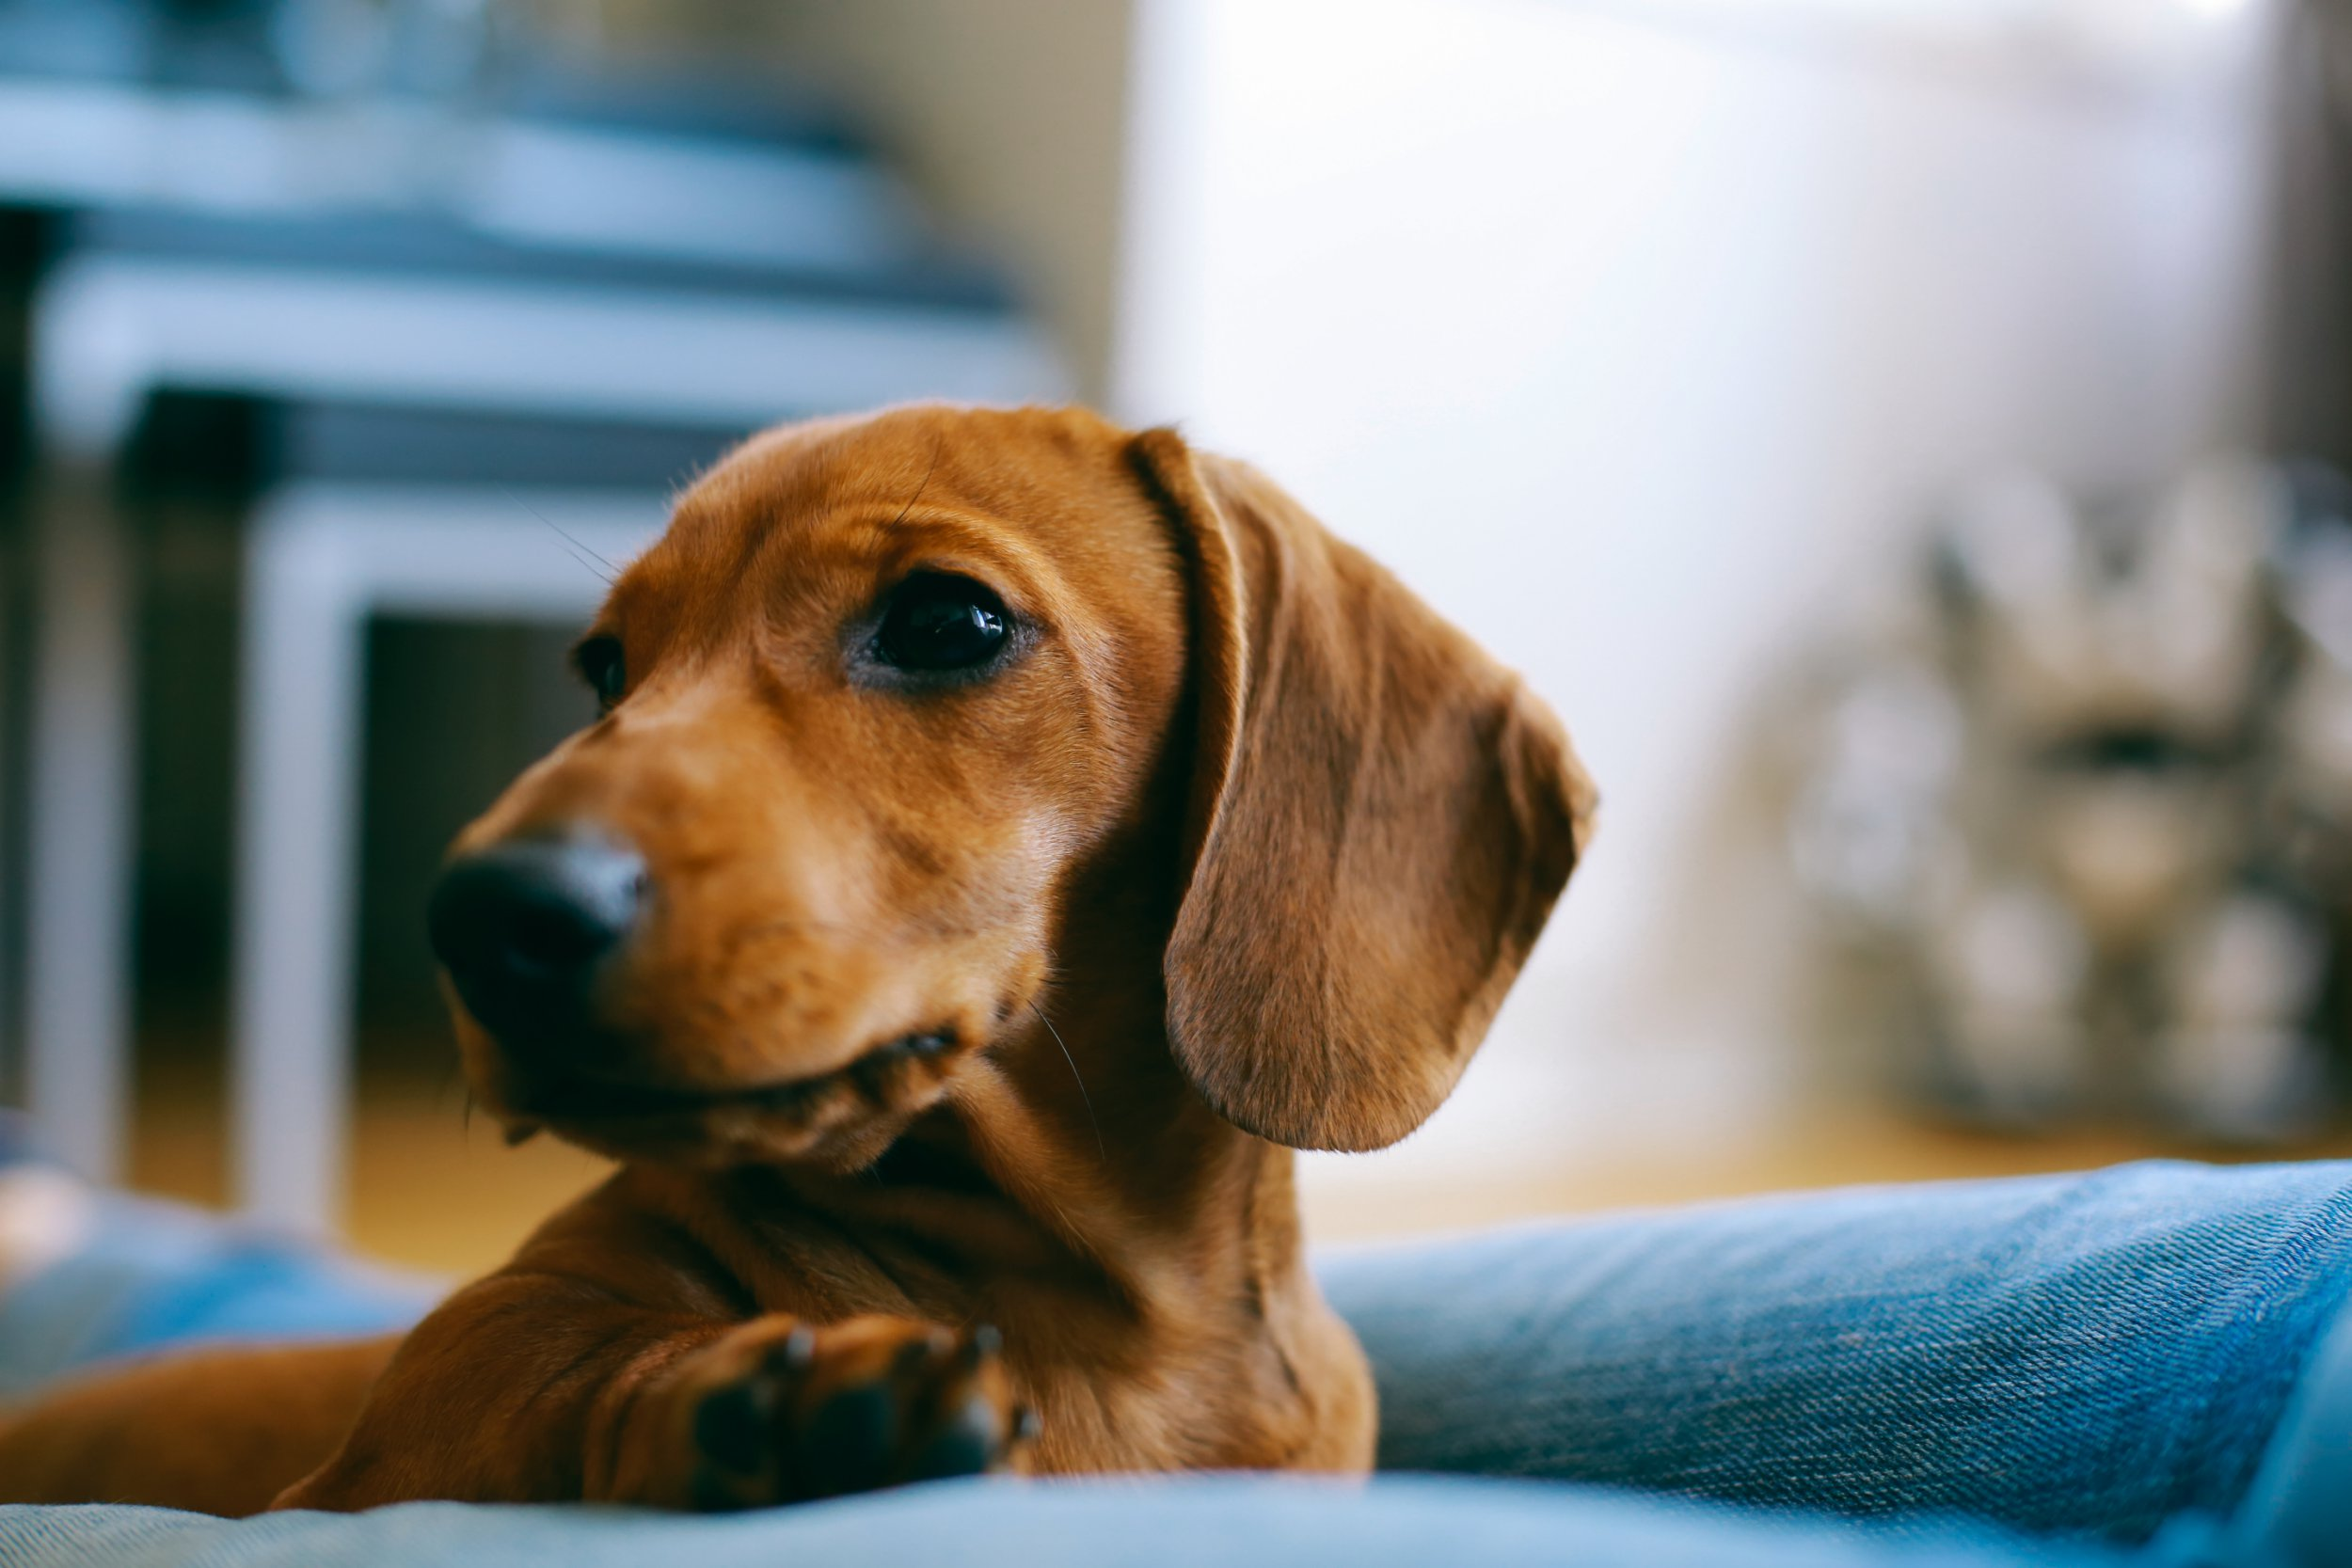 Can I keep a dog in a flat?